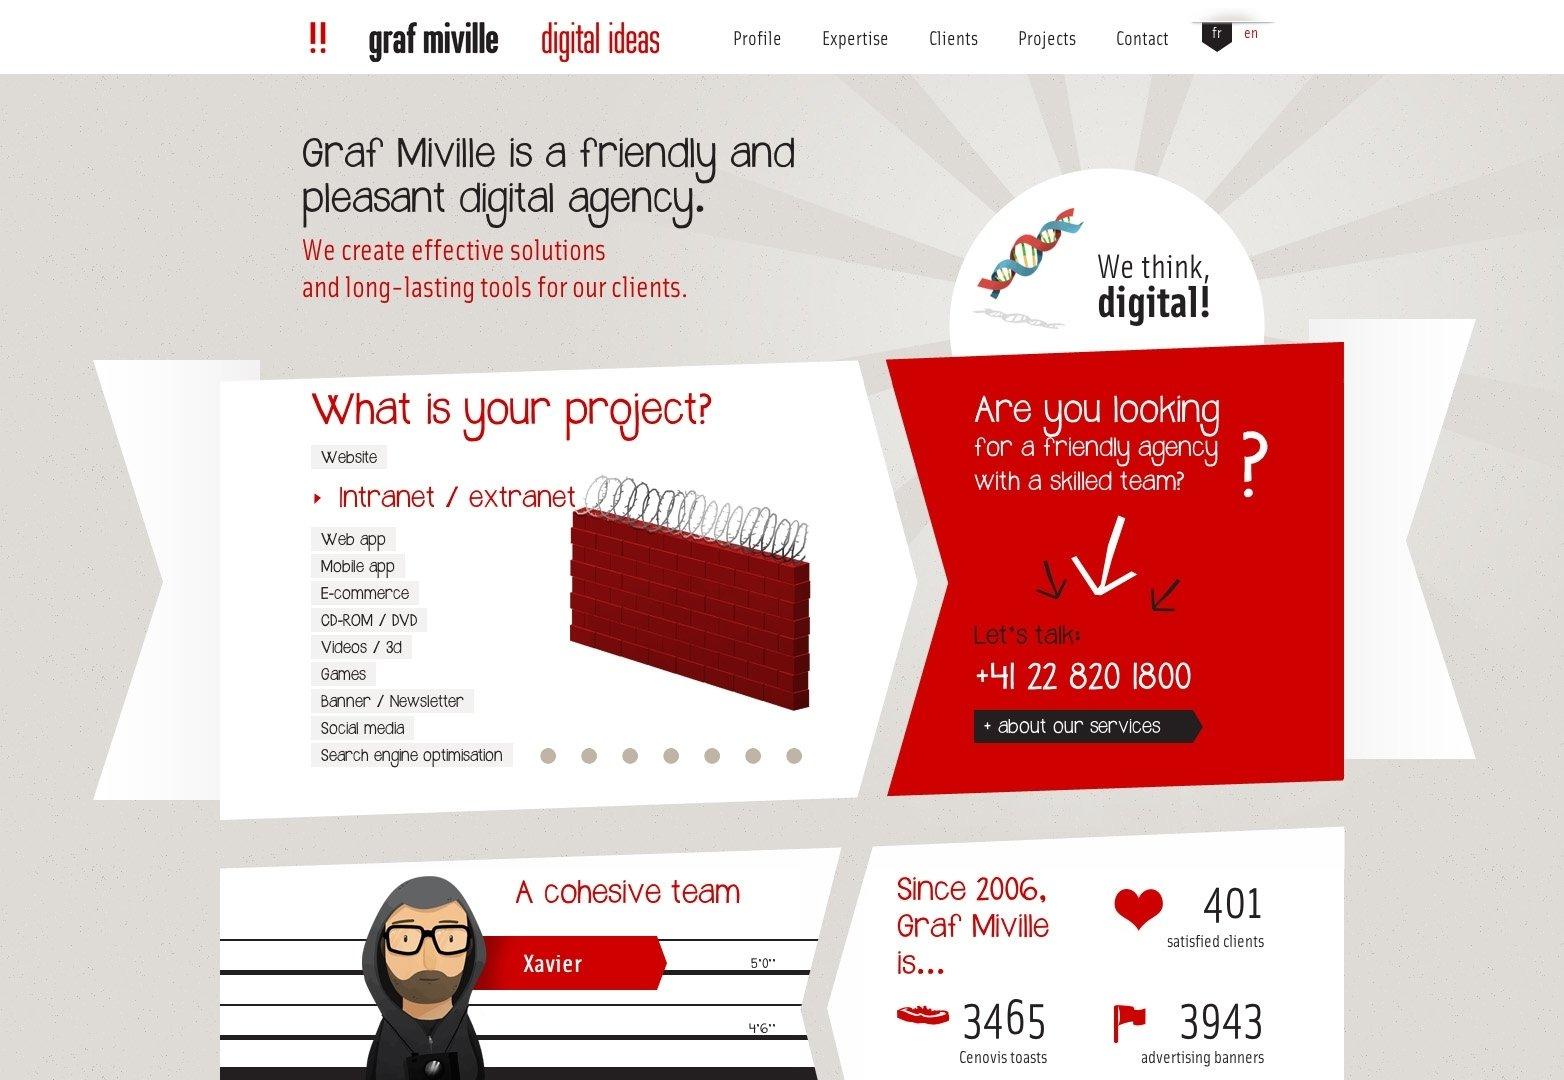 10 Most Recommended Good Ideas For A Website trend alert 20 animated website designs webdesigner depot 2020